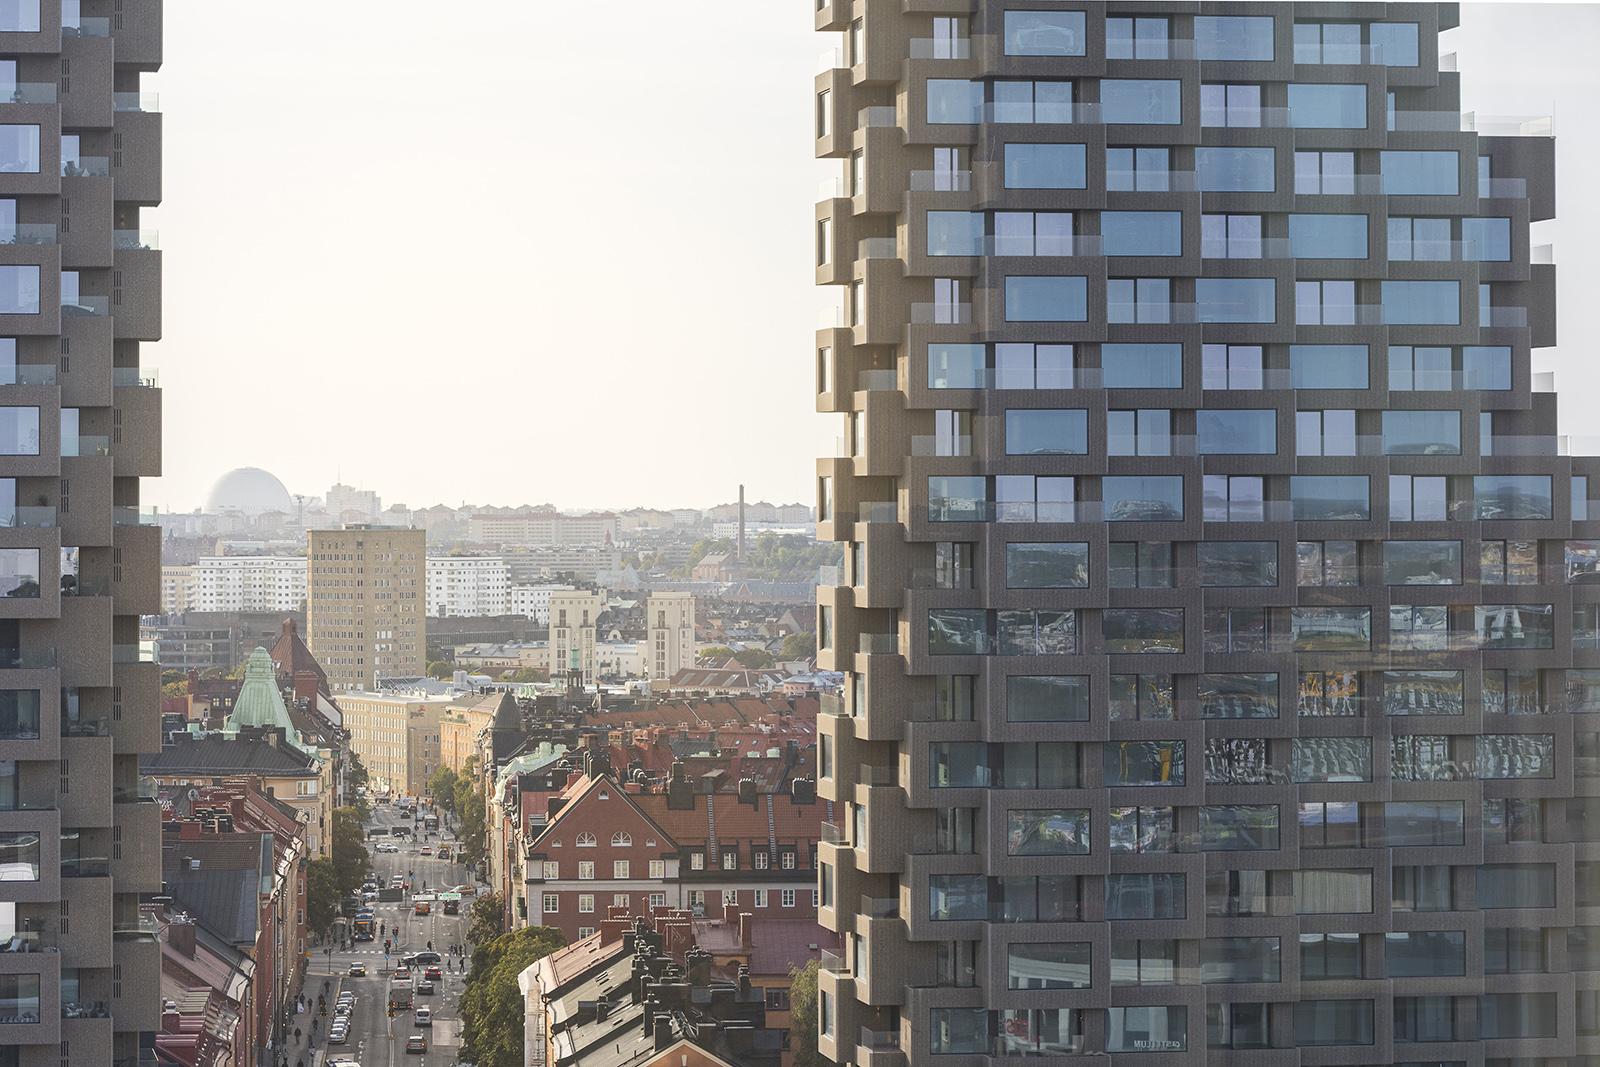 Norra Tornen i Stockholm, exempel på arkitektur som inte anknyter till platsen